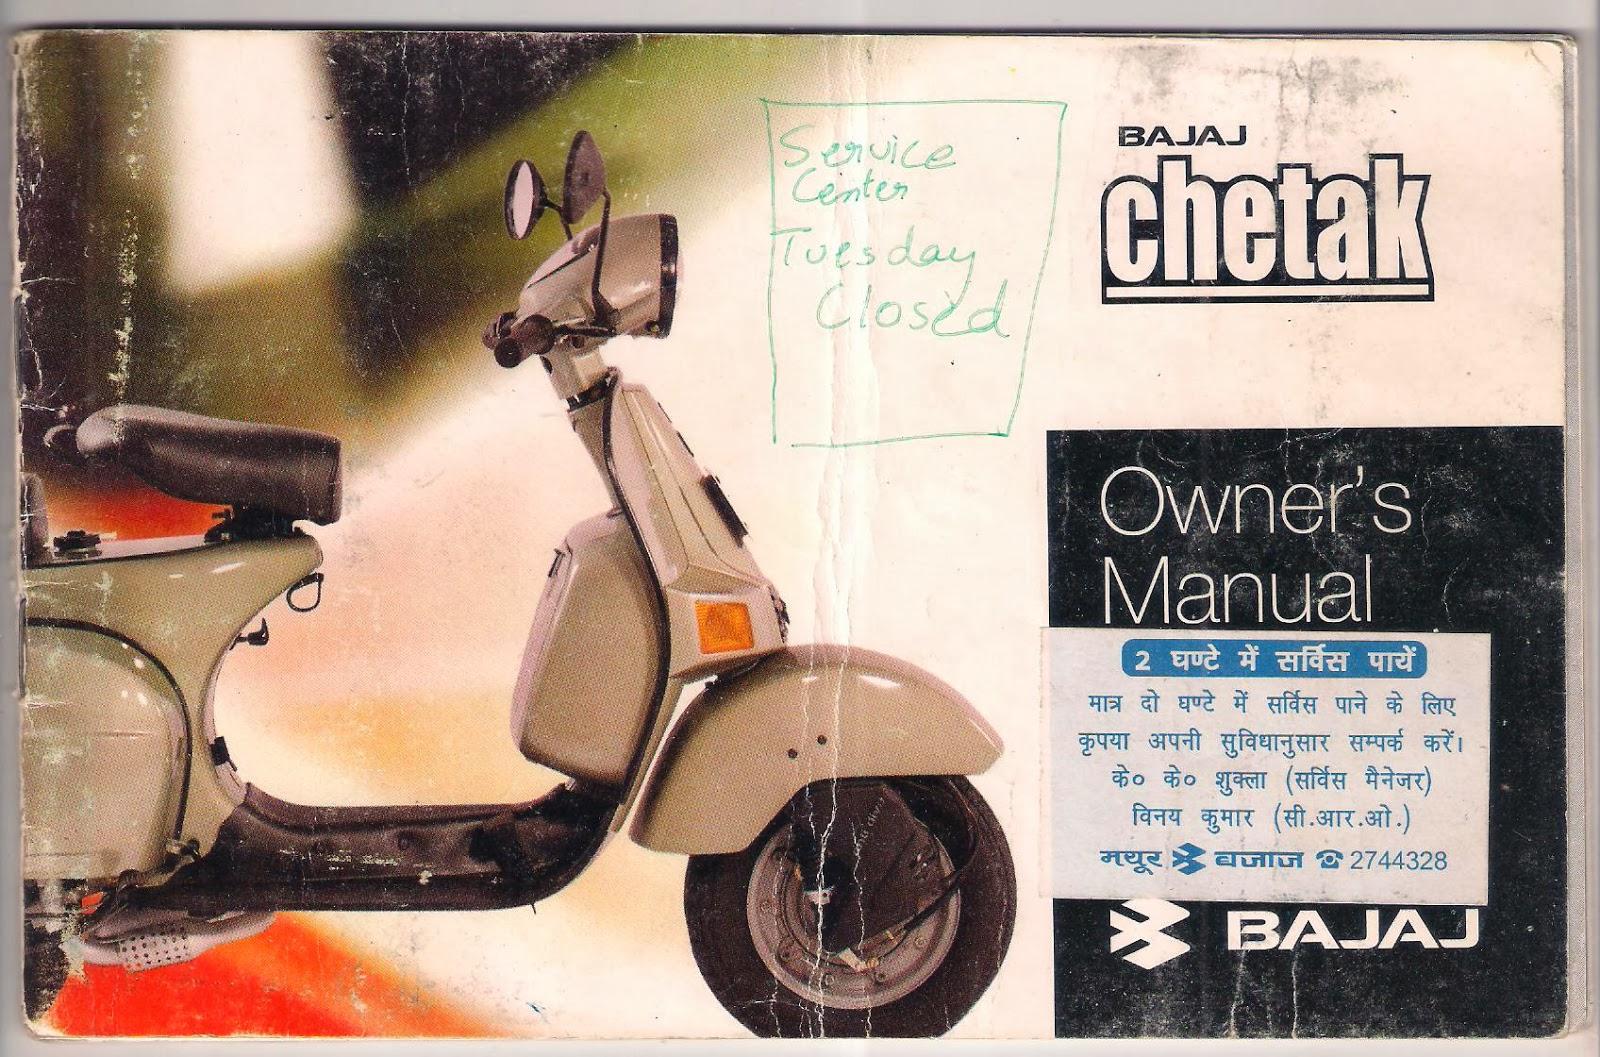 rare motorcycle bajaj chetak 2005 model owners manual rh oldraremotorcycles blogspot com bajaj chetak workshop manual bajaj chetak user manual